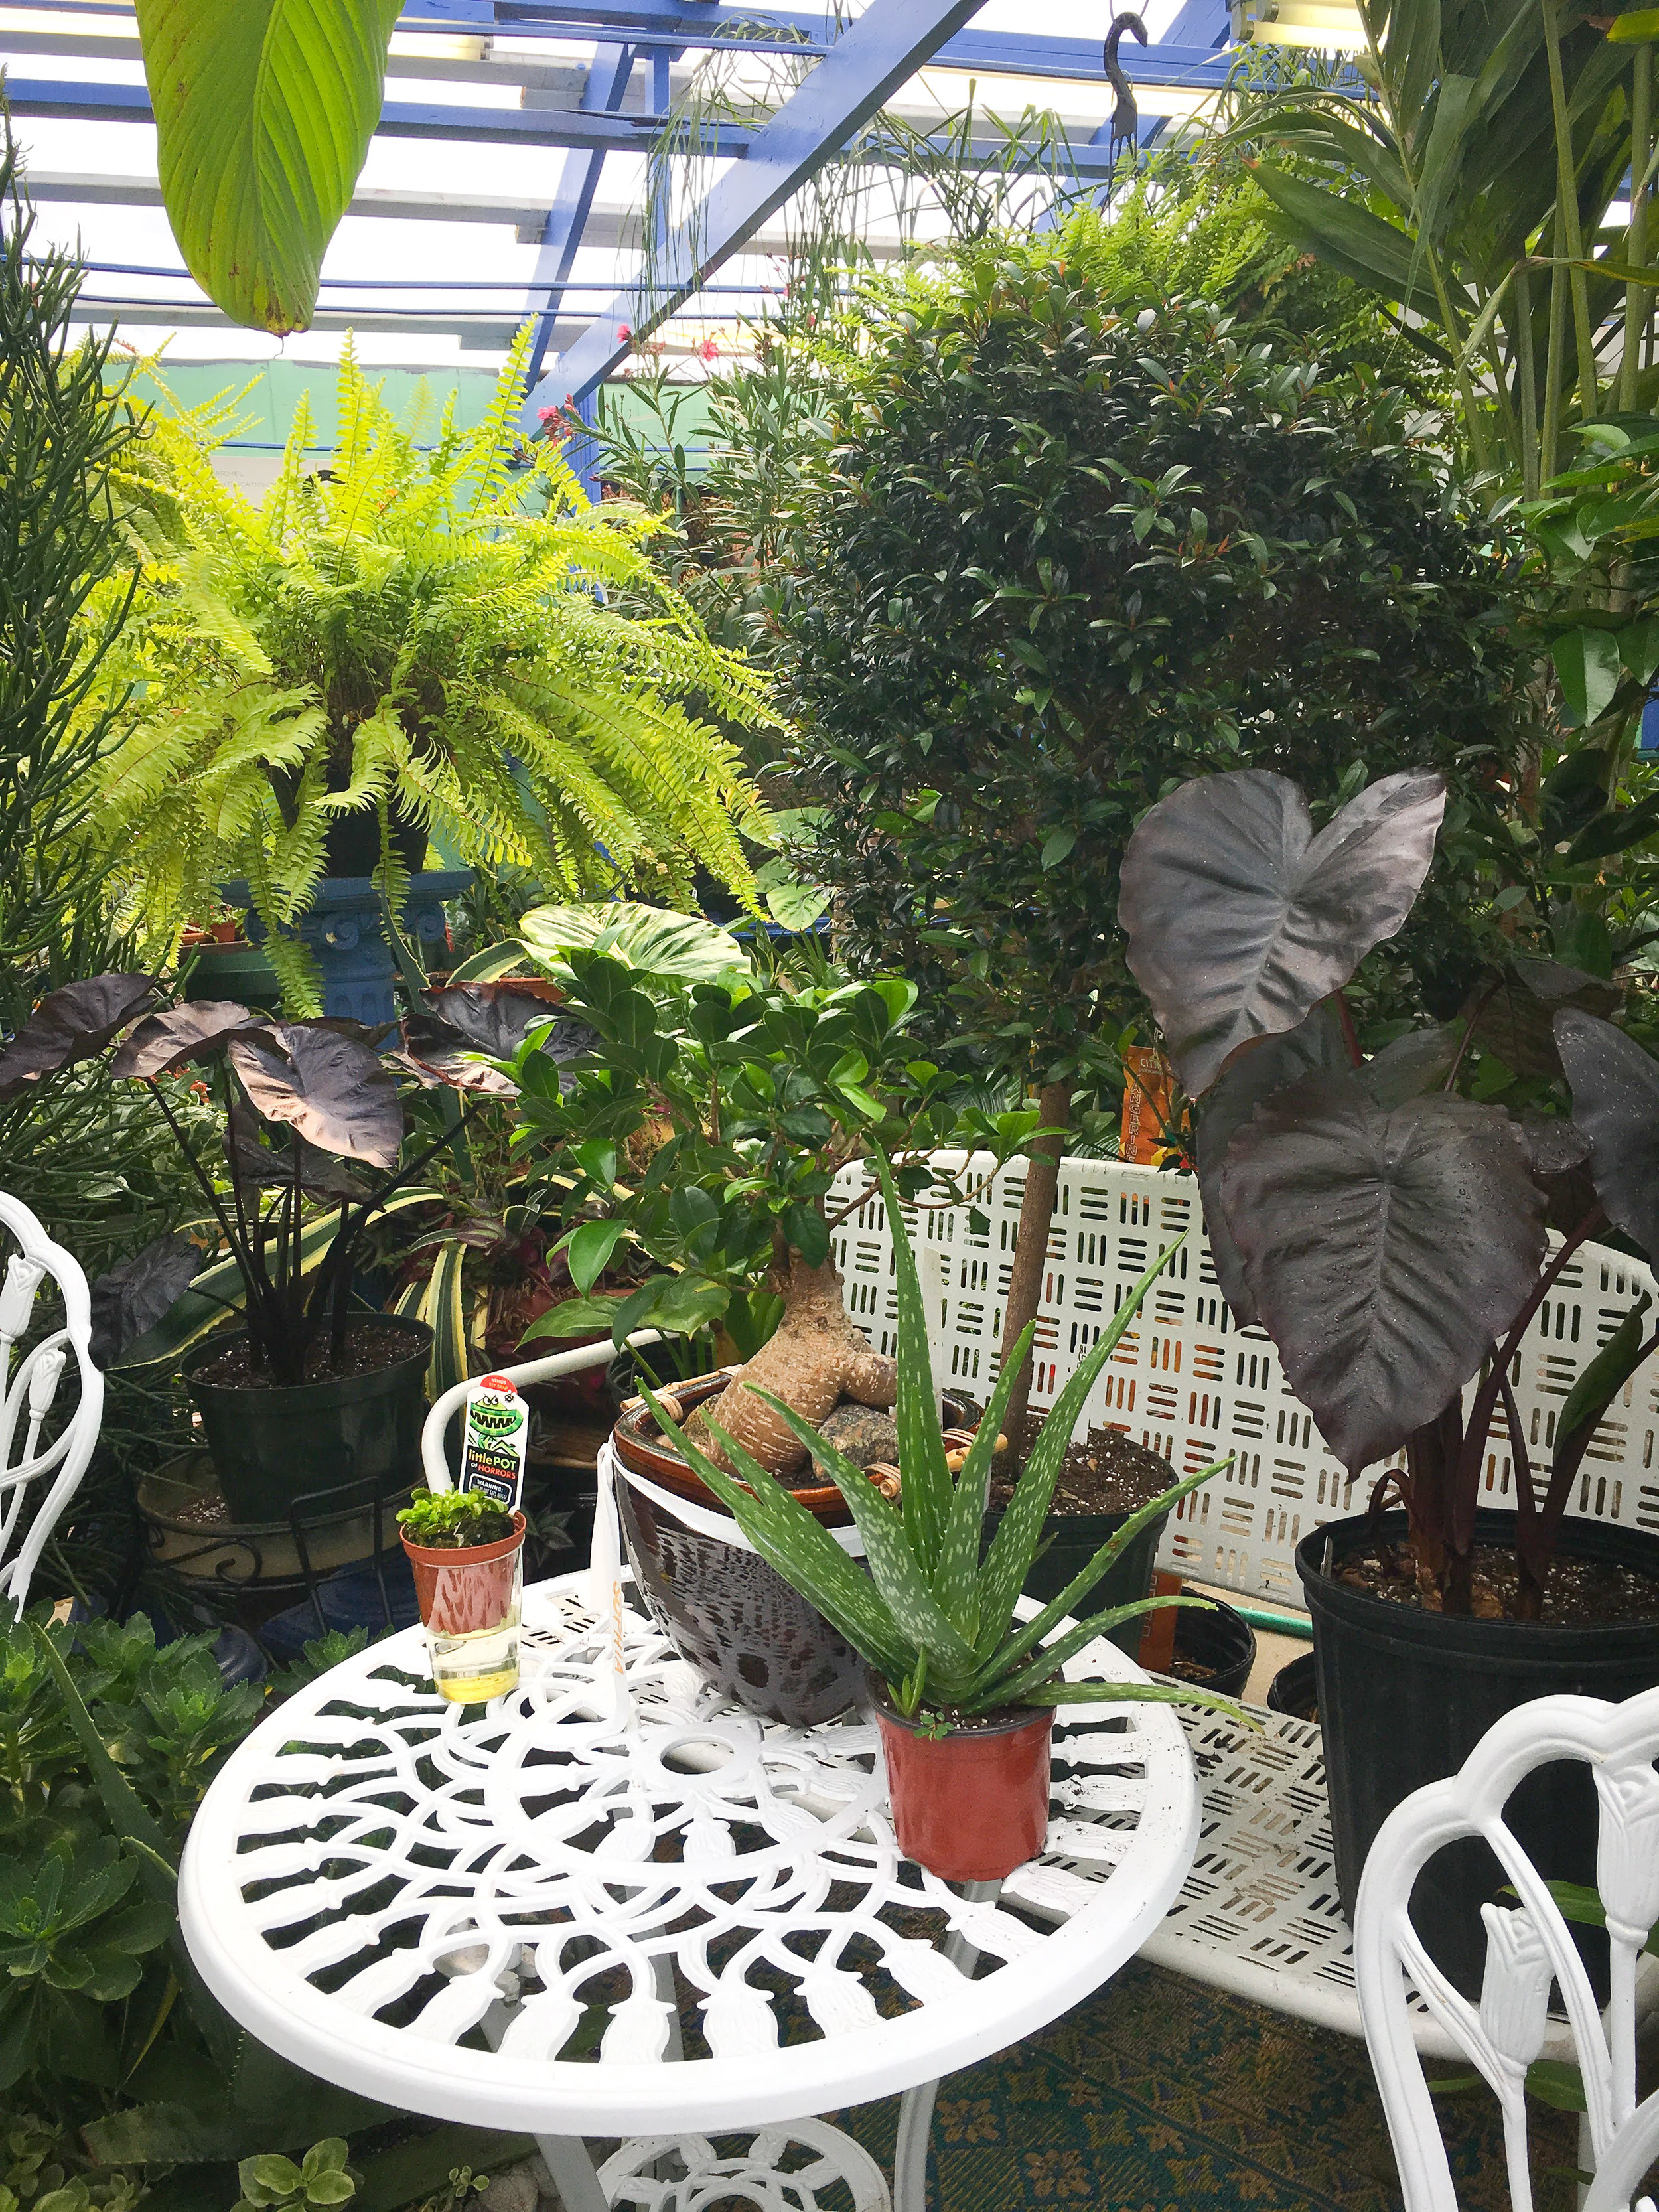 Succulents, Green House, Garden Center, Westchester Flower Shops, Indoor Plants, Outdoor Plants, NY Nurseries, Nursery, Landscaper, Florist, indoor Decoration, Outdoor Furniture.